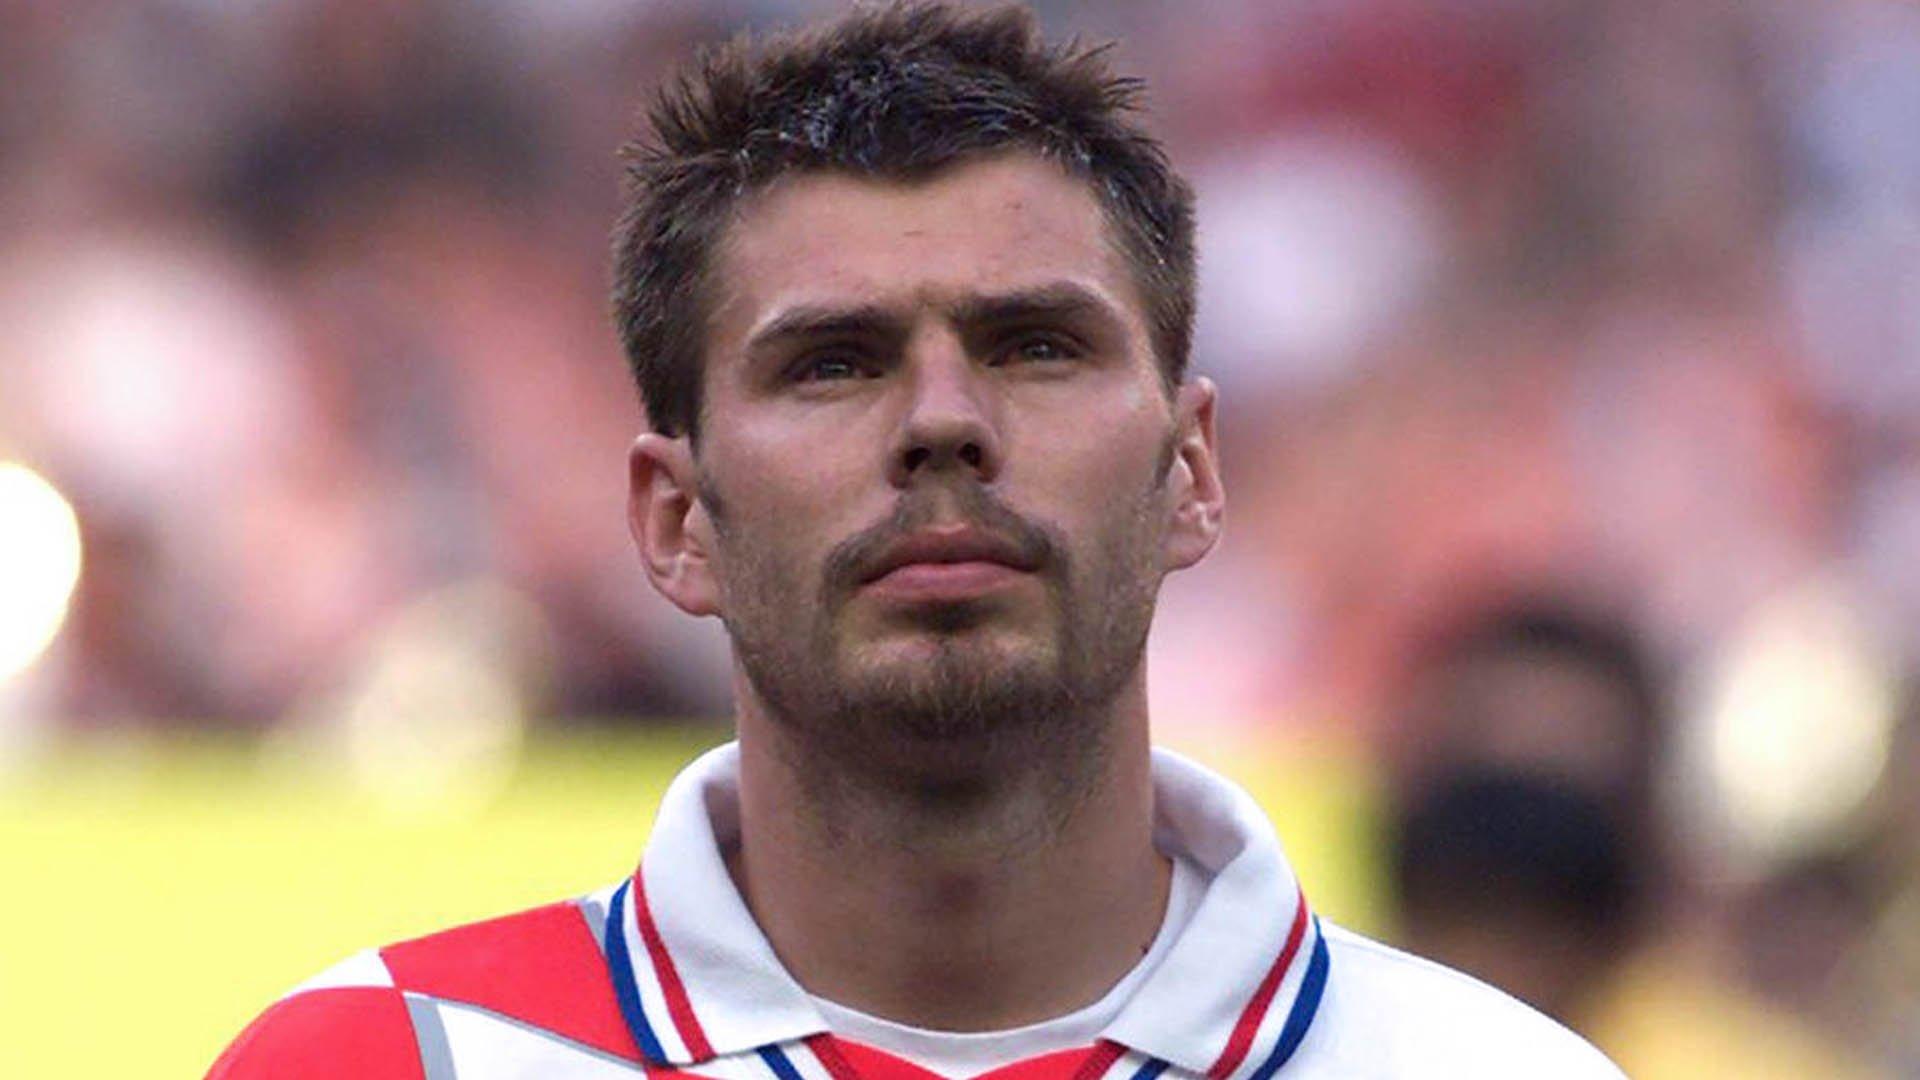 Il calciatore Zvonimir Boban poi passato al Milan